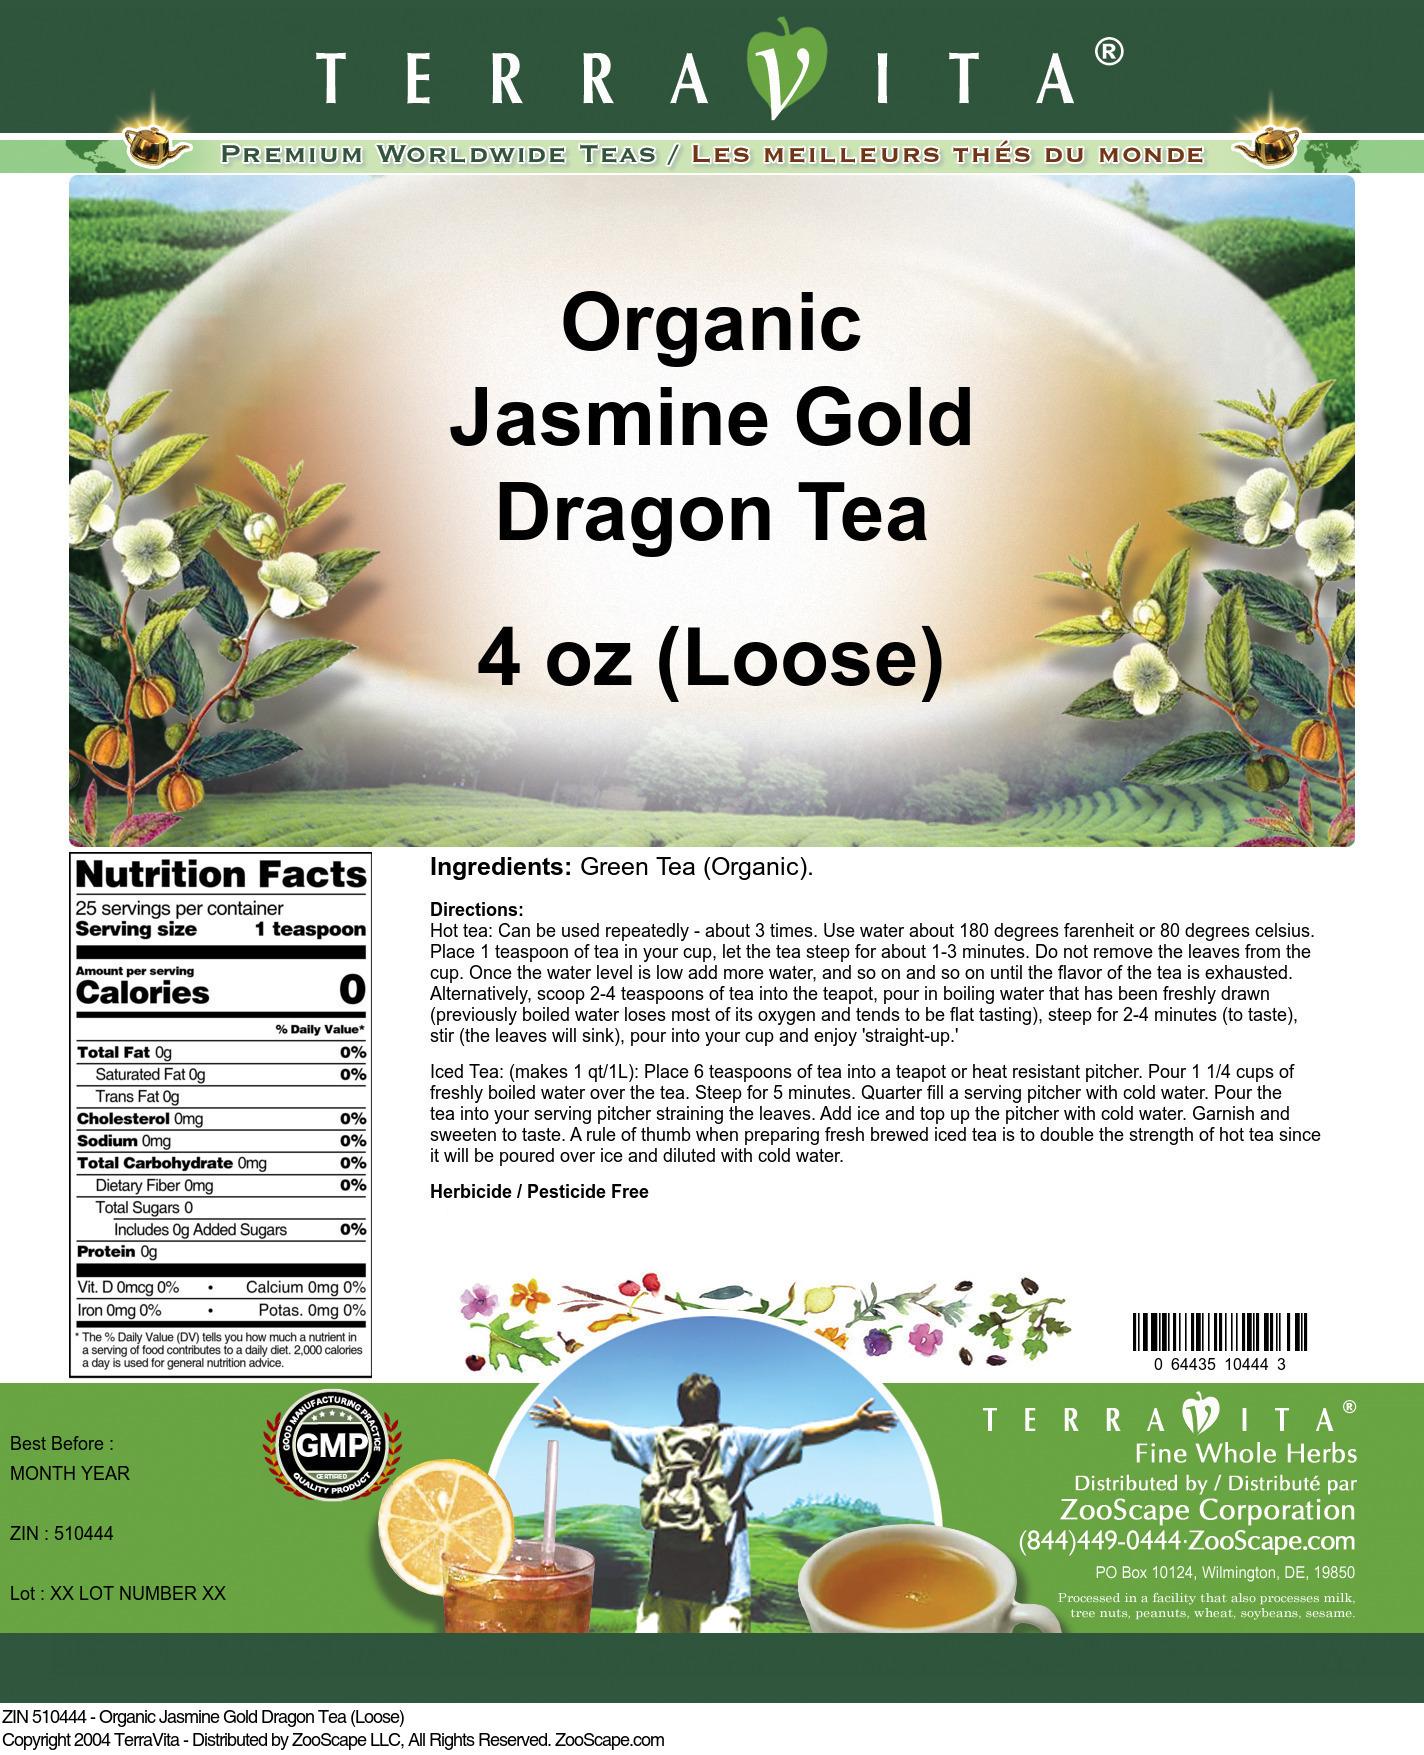 Organic Jasmine Gold Dragon